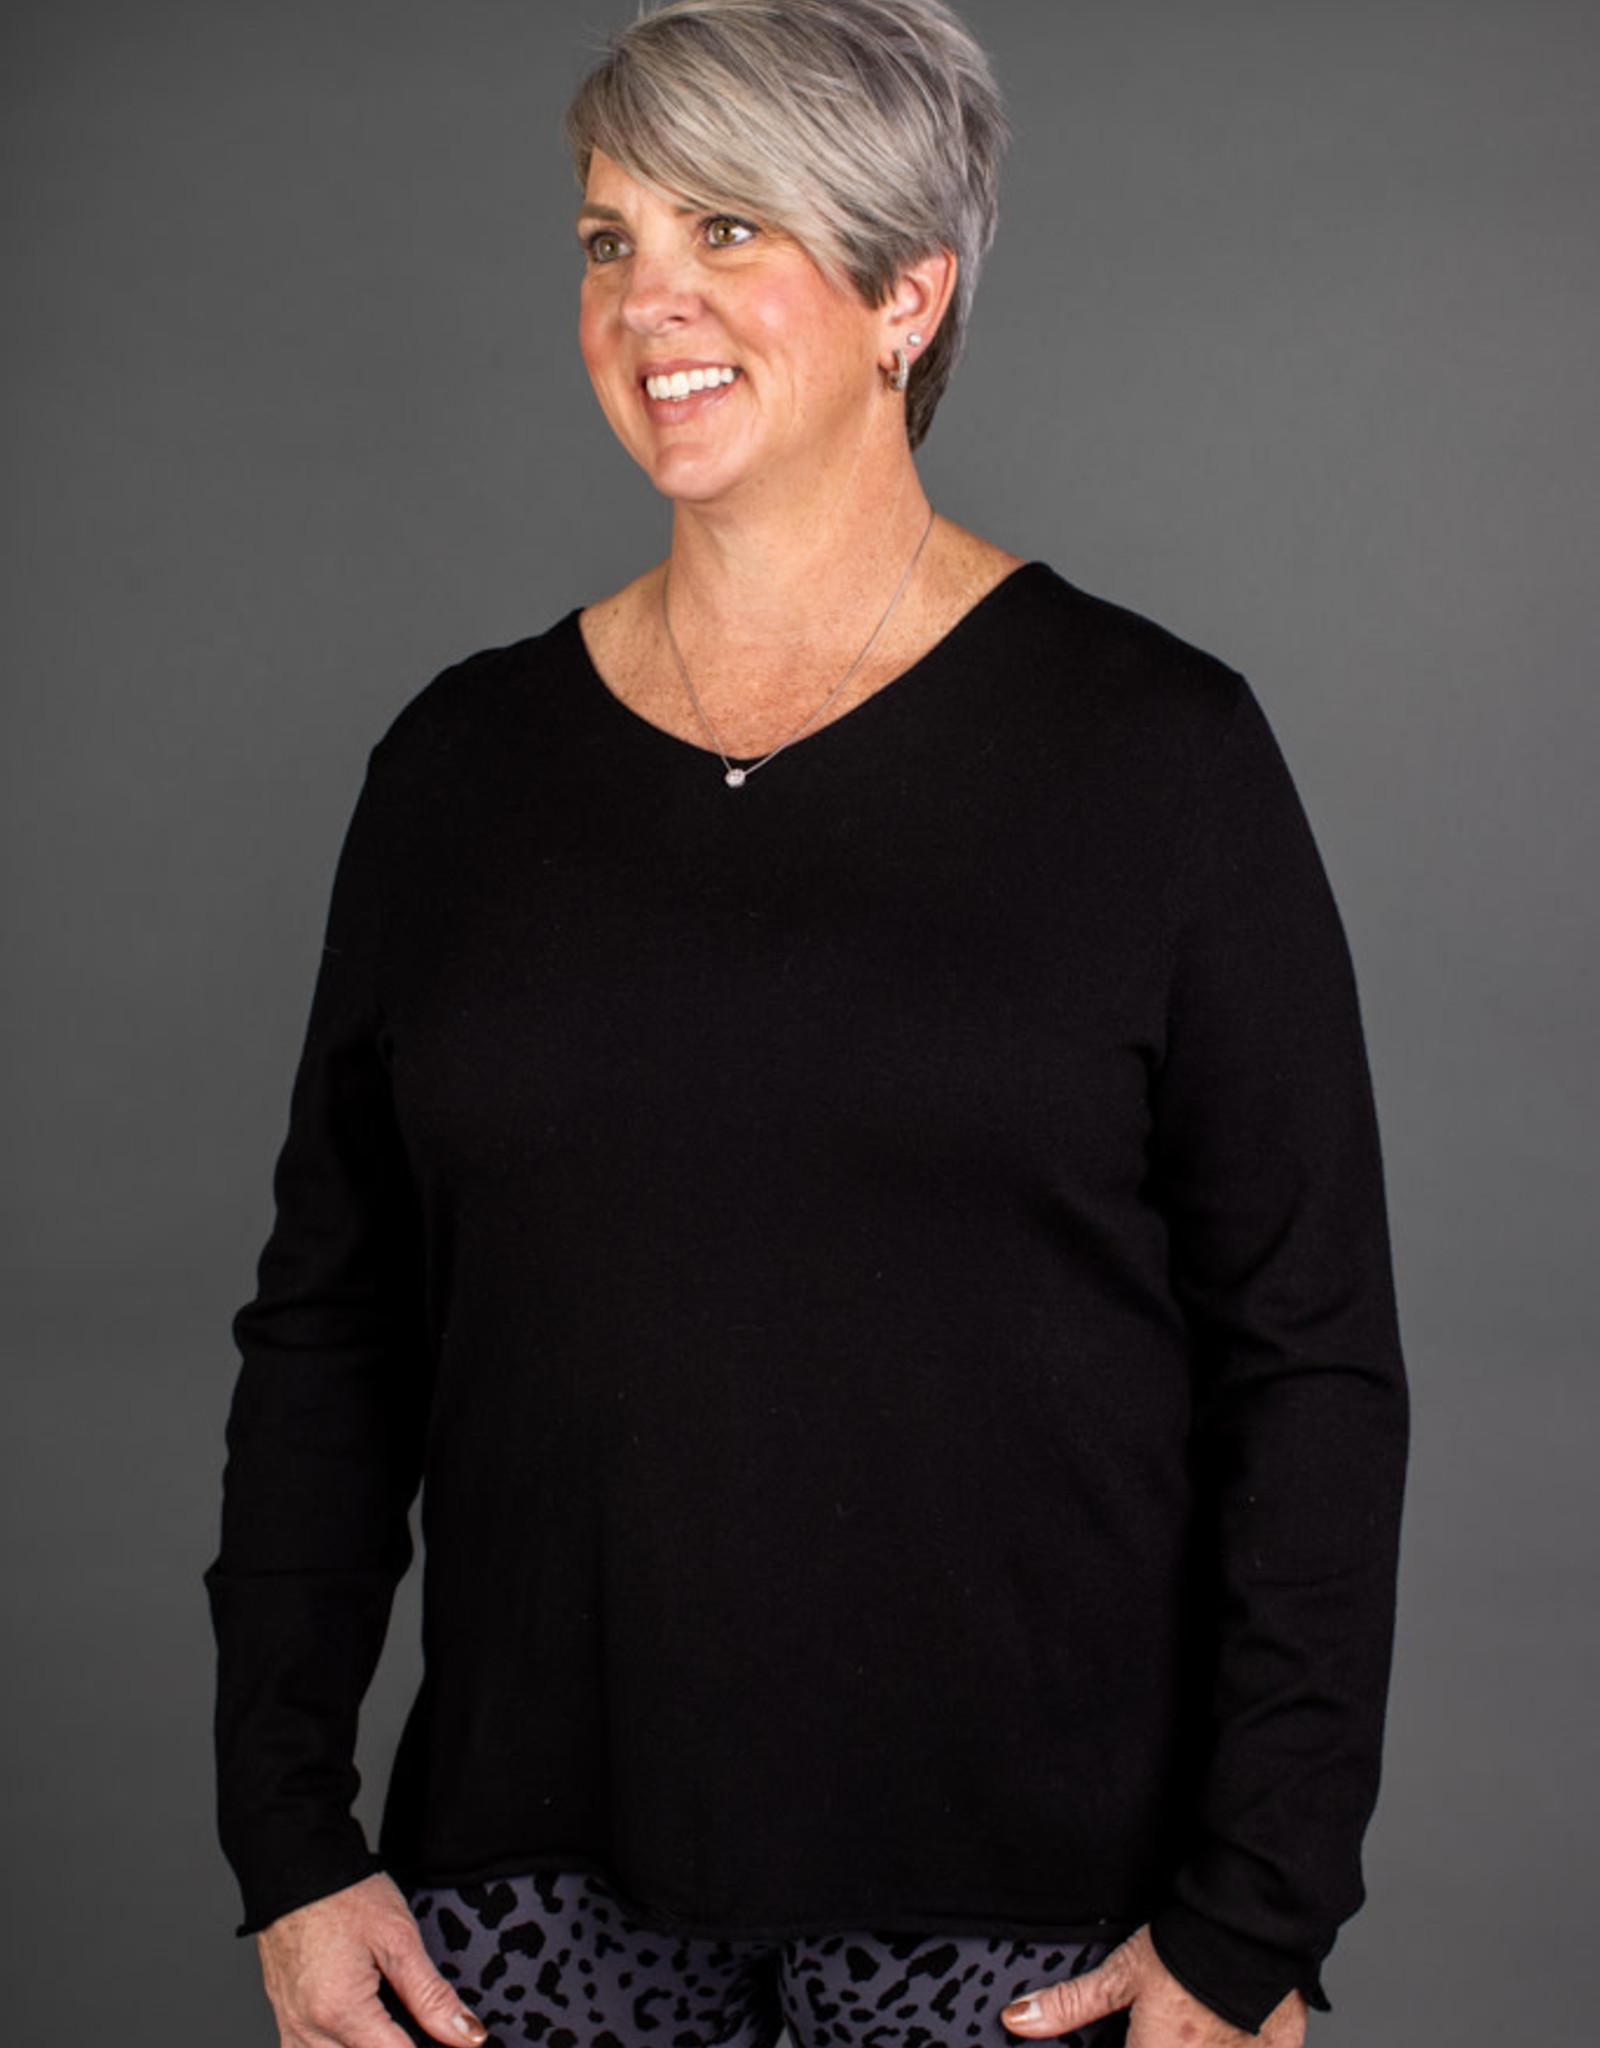 Veronica Vneck Sweater